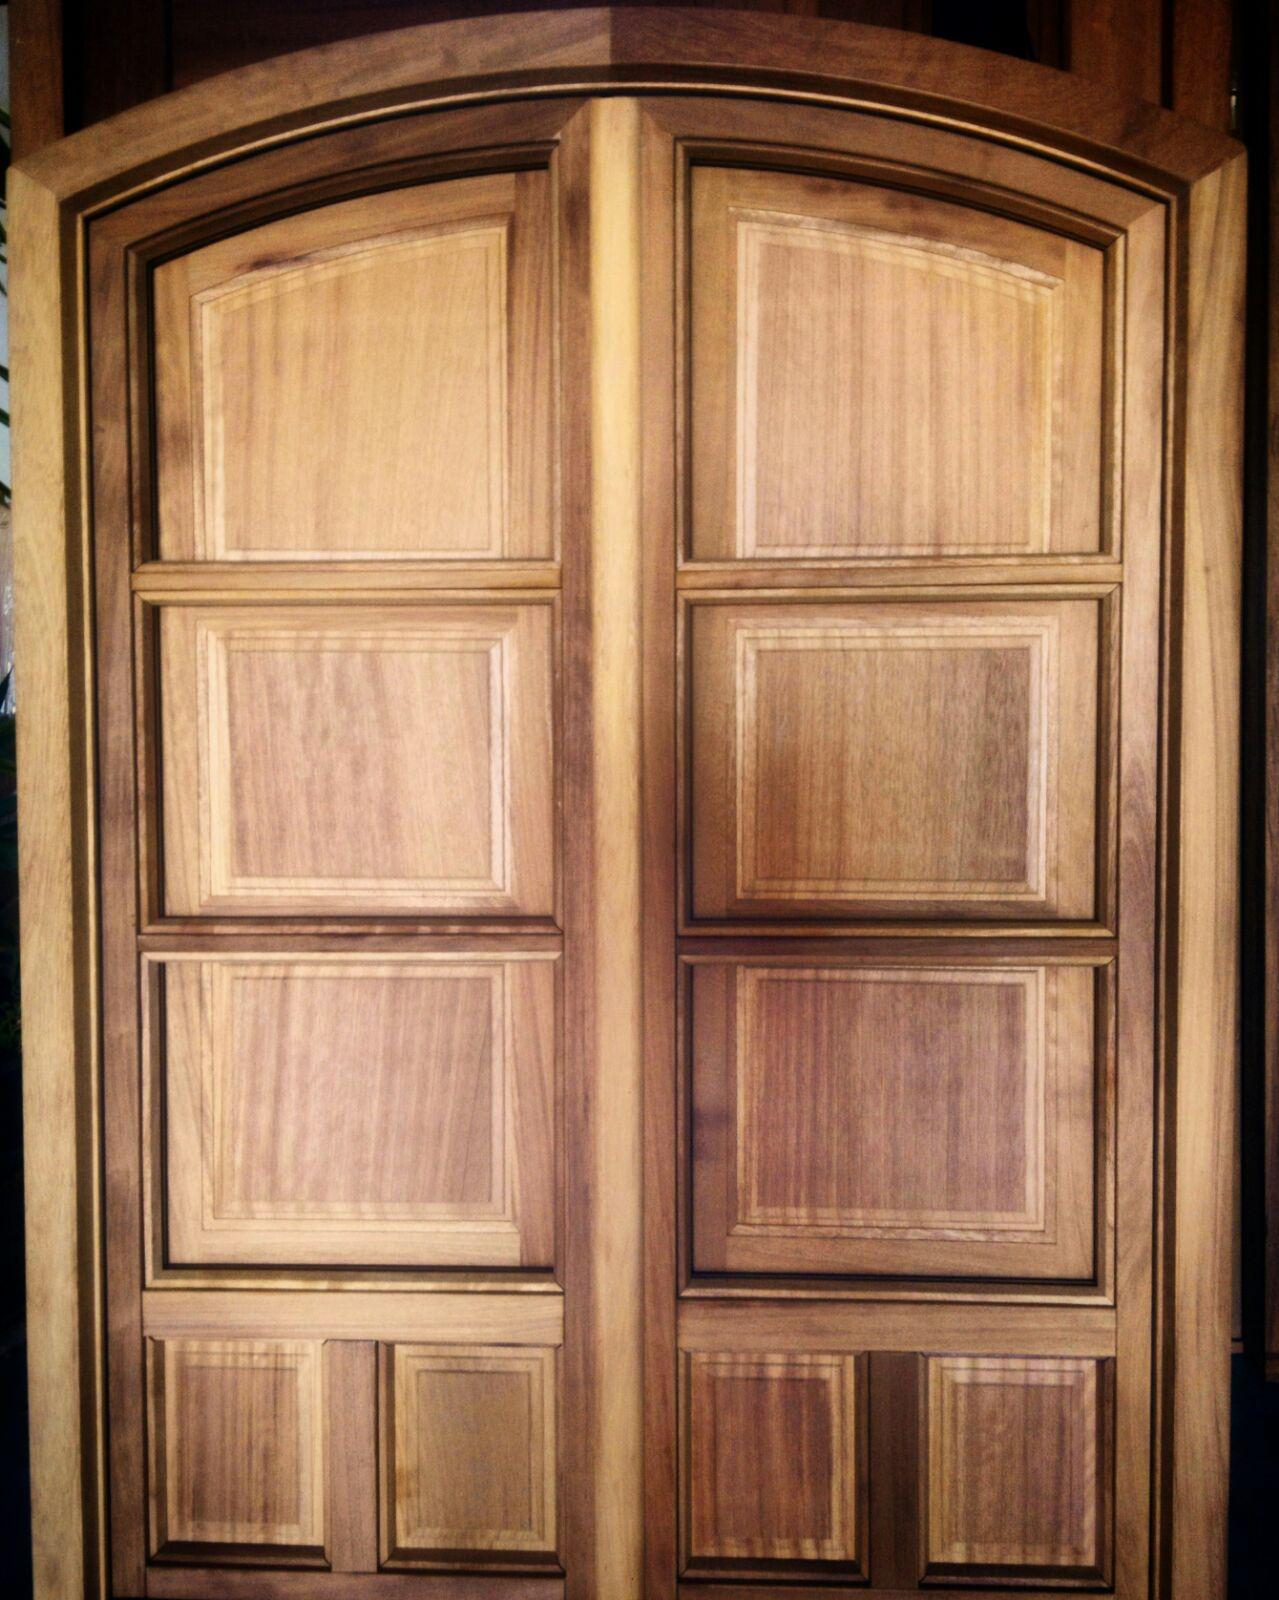 Blog Carpinteria Bacigalupe - Página 2 de 3 - Carpintería, puertas ...